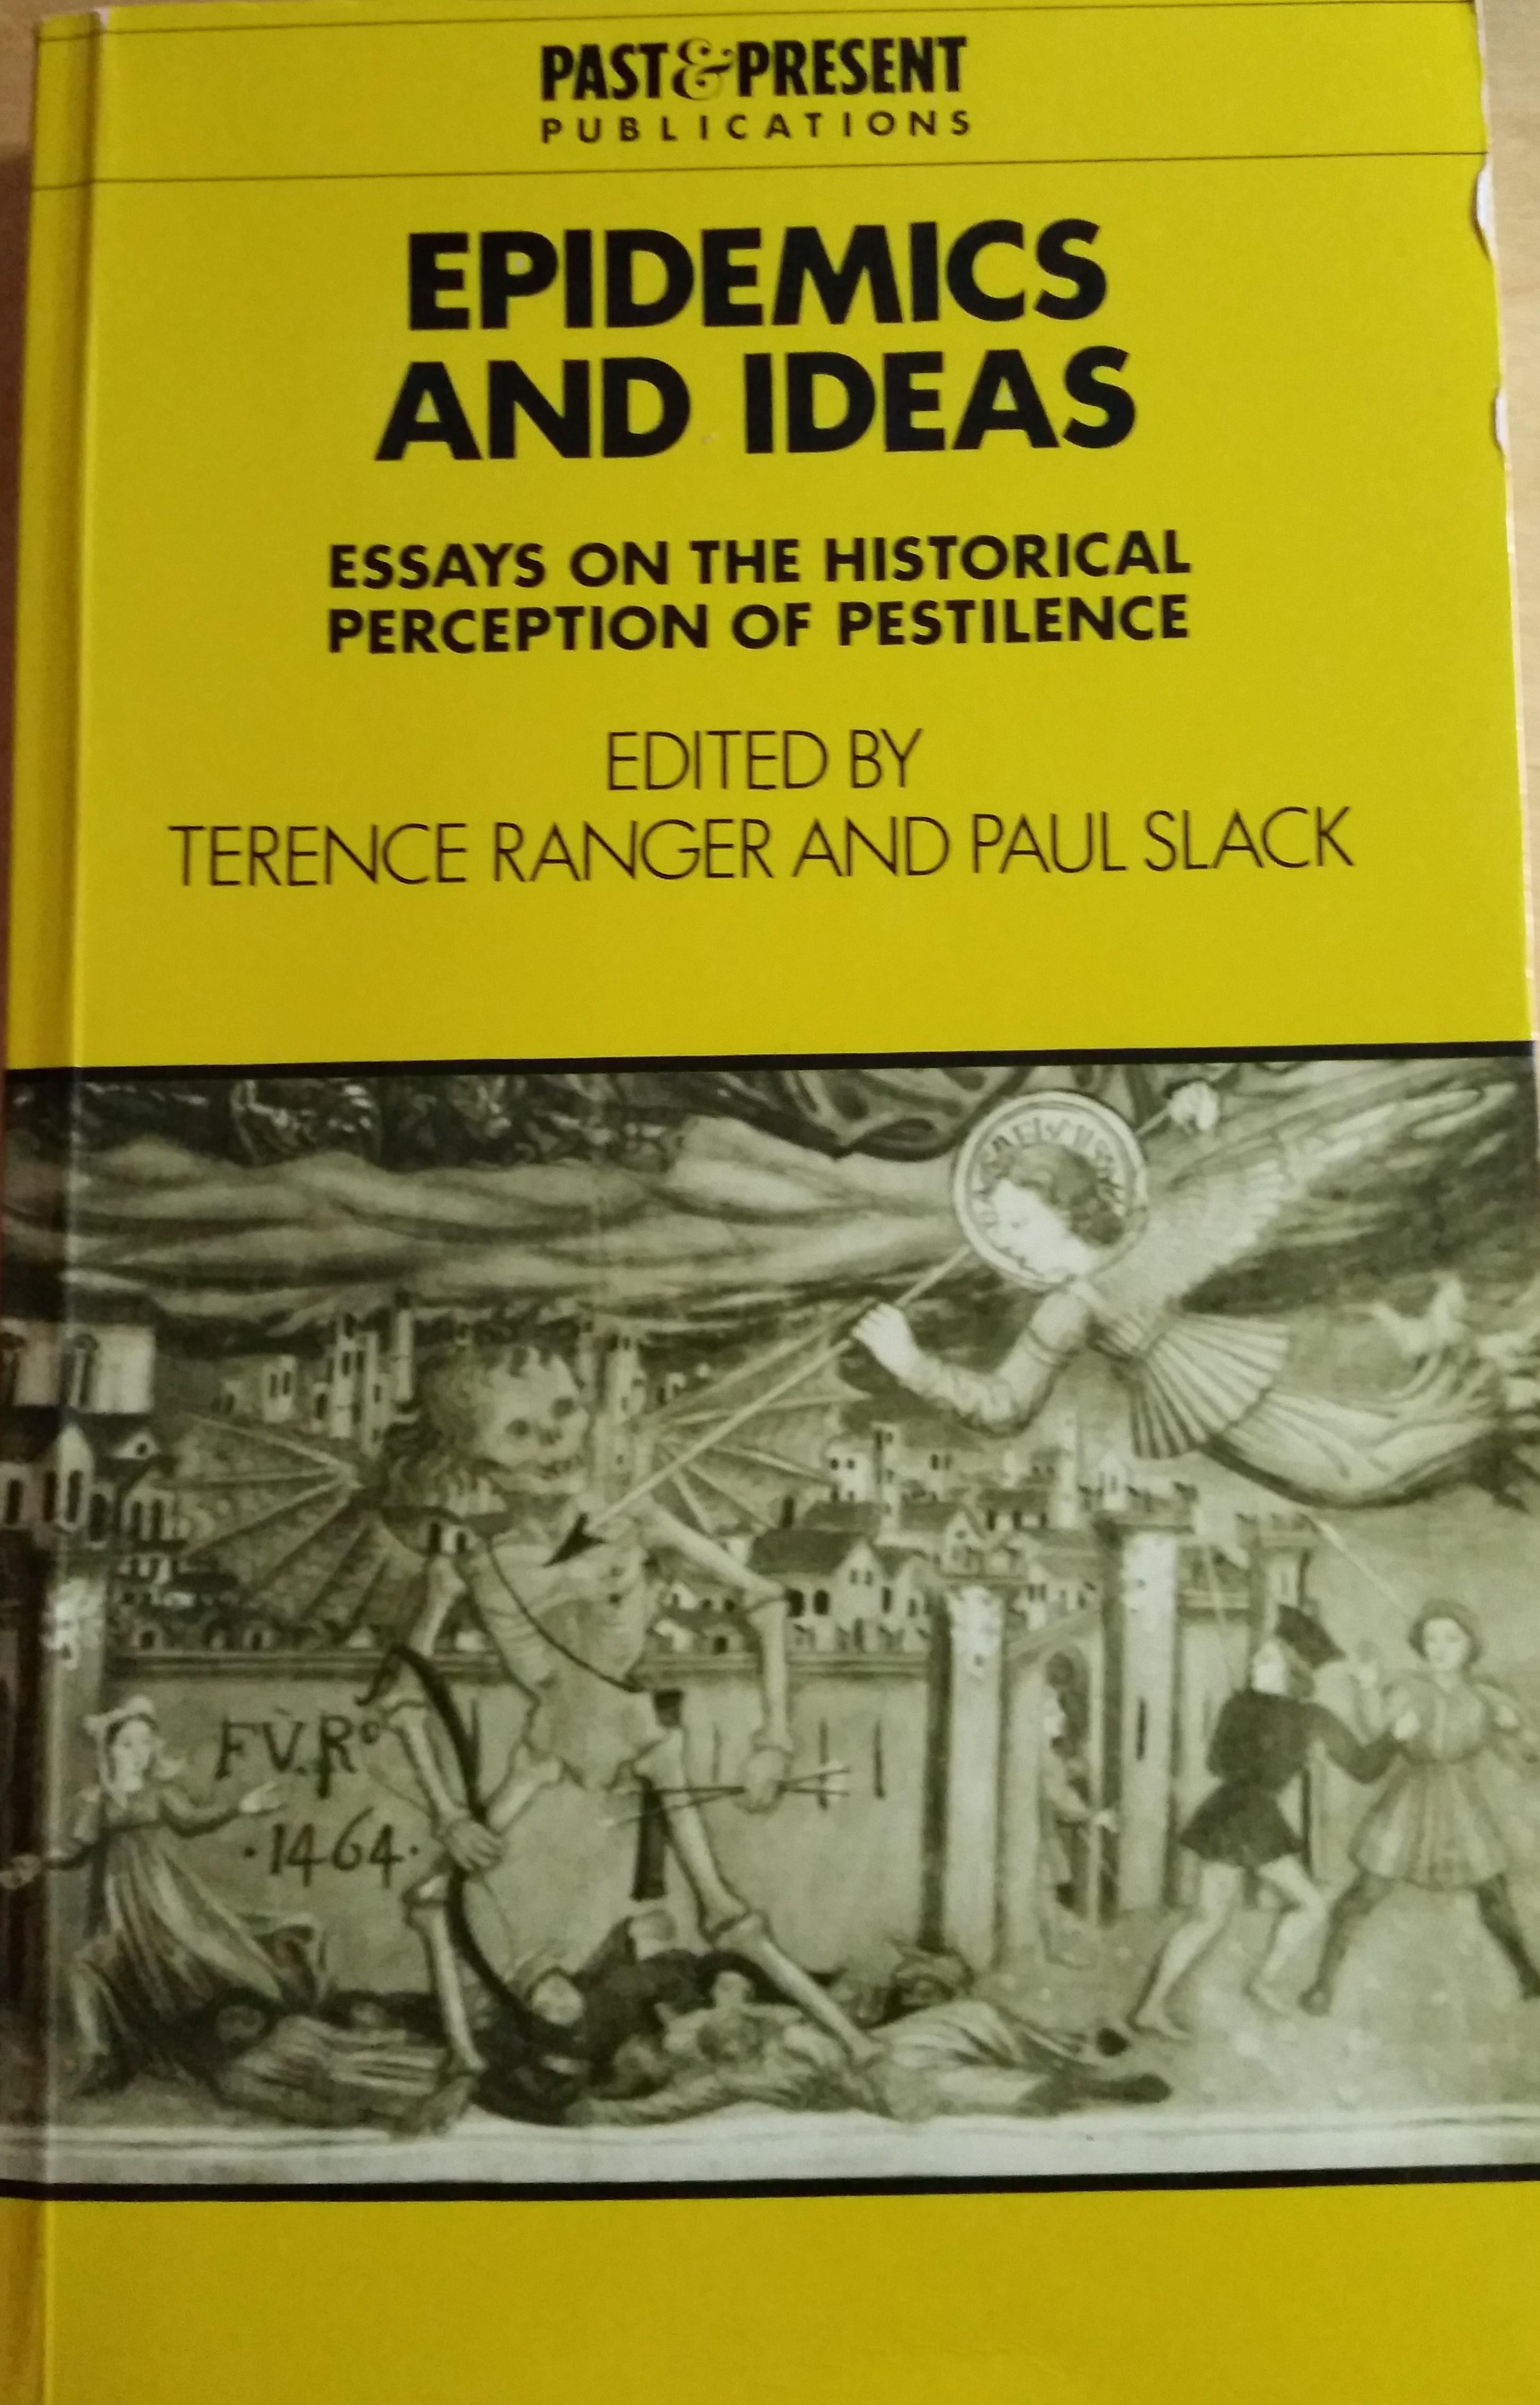 Neu in der Bibliothek: Epidemic and Ideas